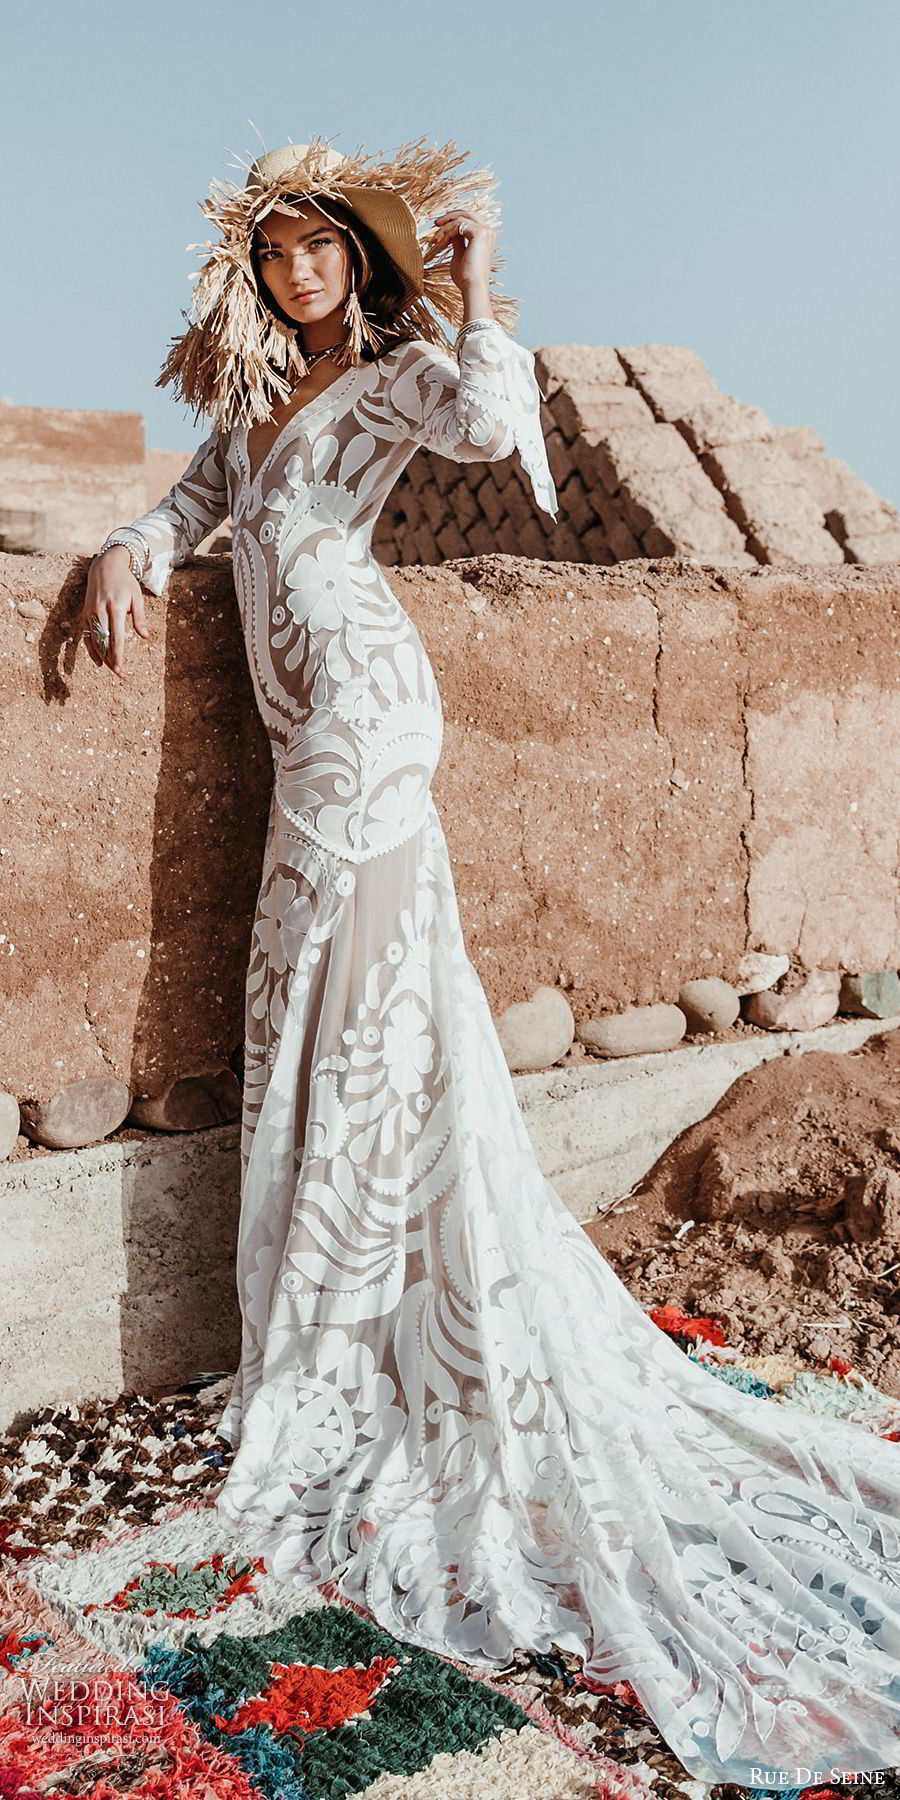 rue de seine 2019 bridal sheer long sleeves deep v neckline lace sheath wedding dress (6) boho chic romantic low open back hapel train mv